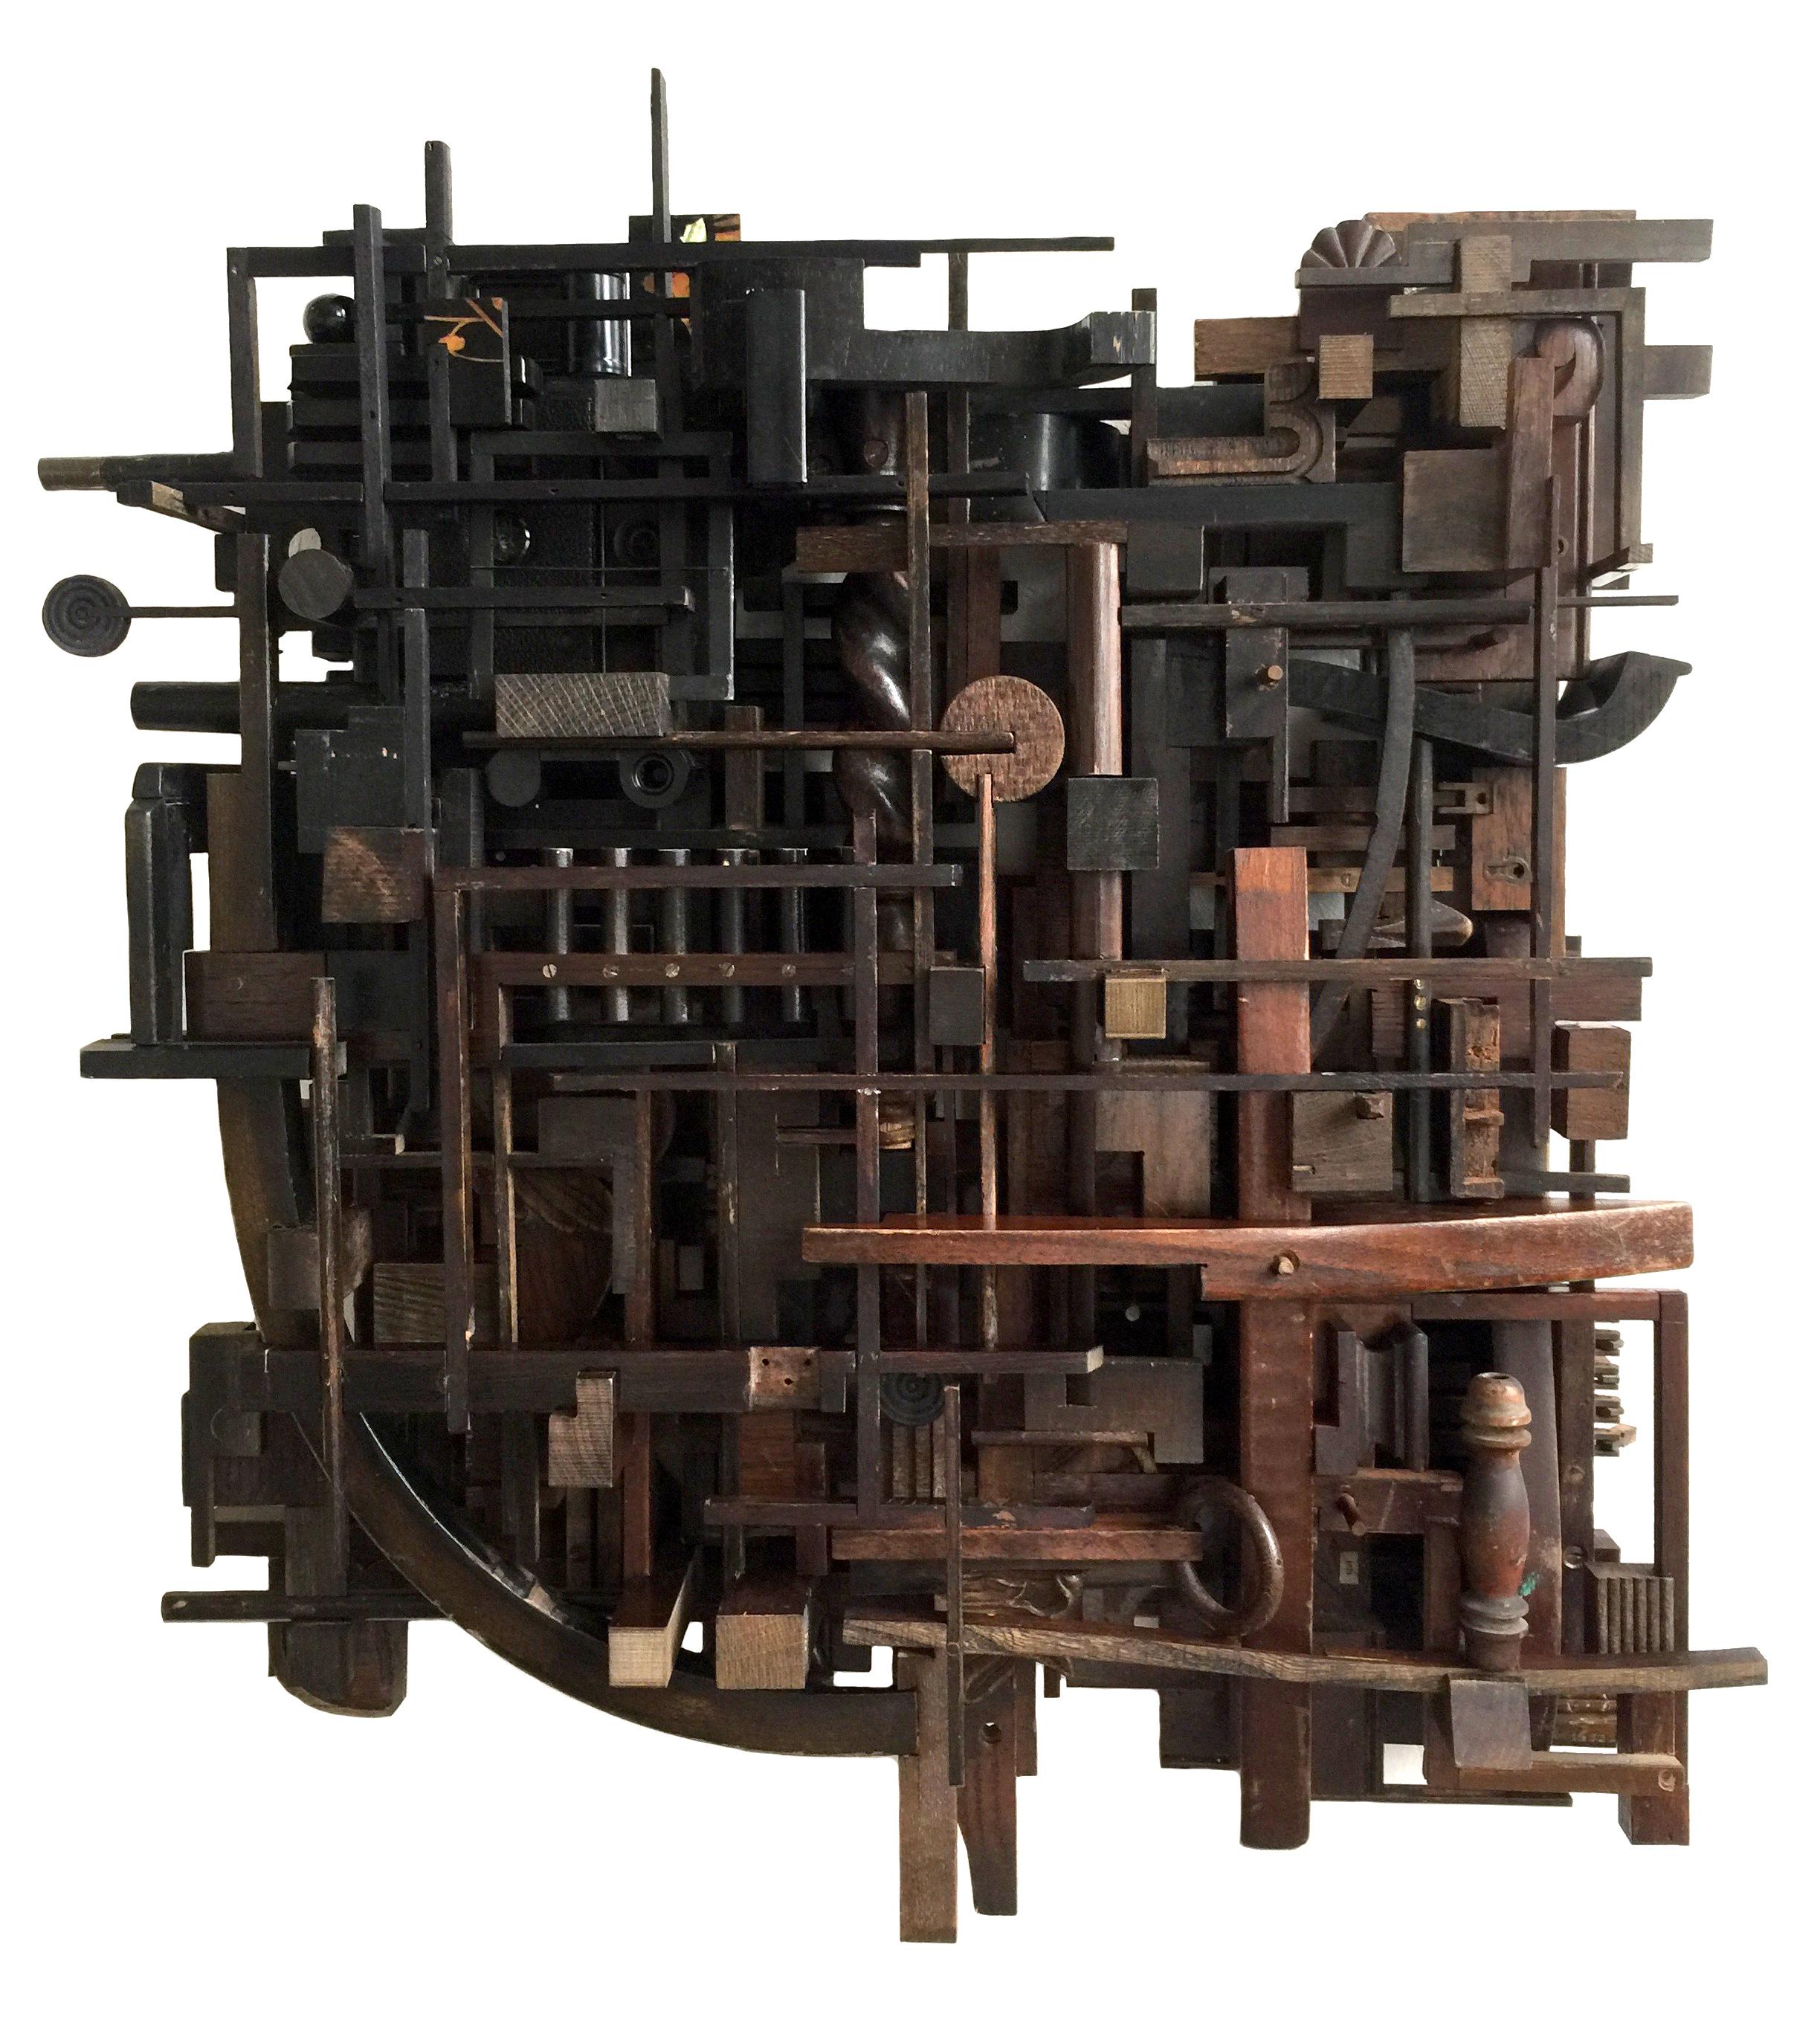 Lesley Hilling: Handel's Windometer